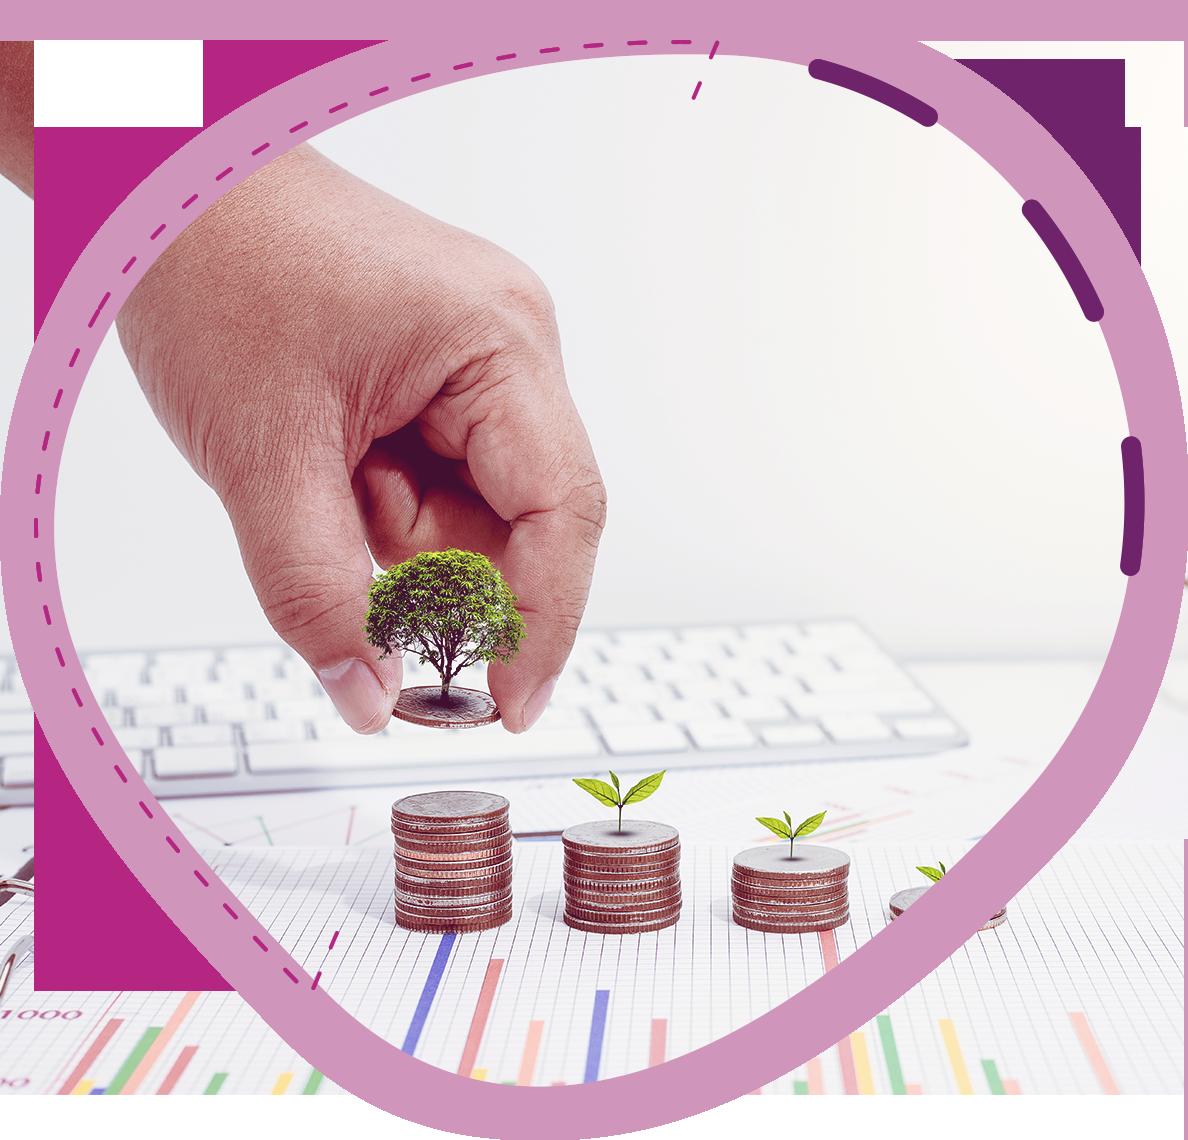 Savings Investment